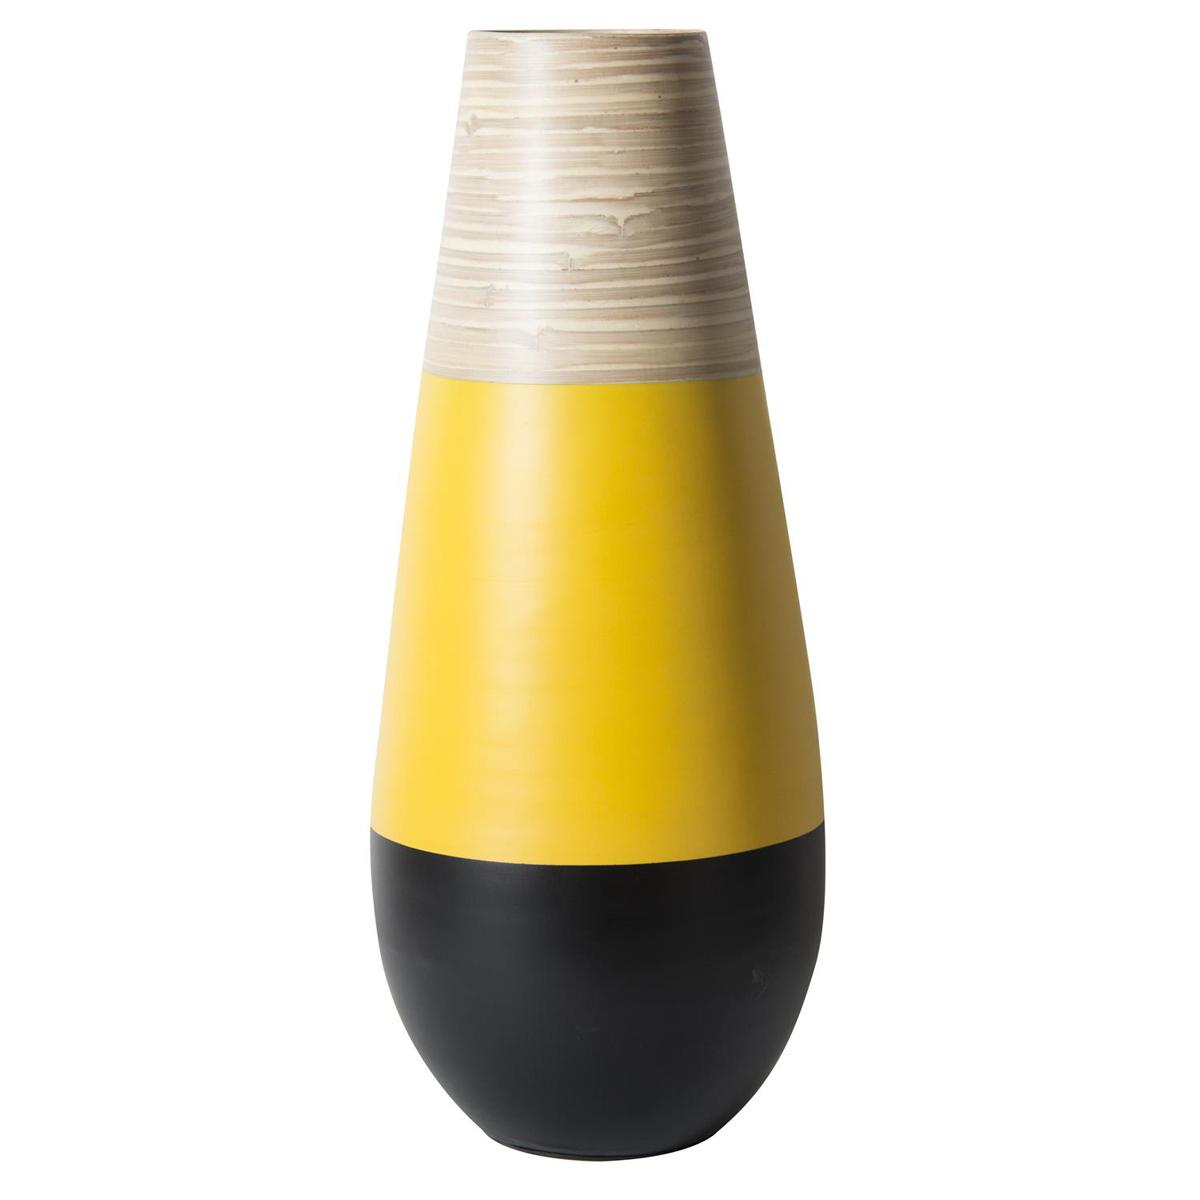 Vase jarre bambou \'Boho\' jaune noir - 50x10 cm - [Q7739]